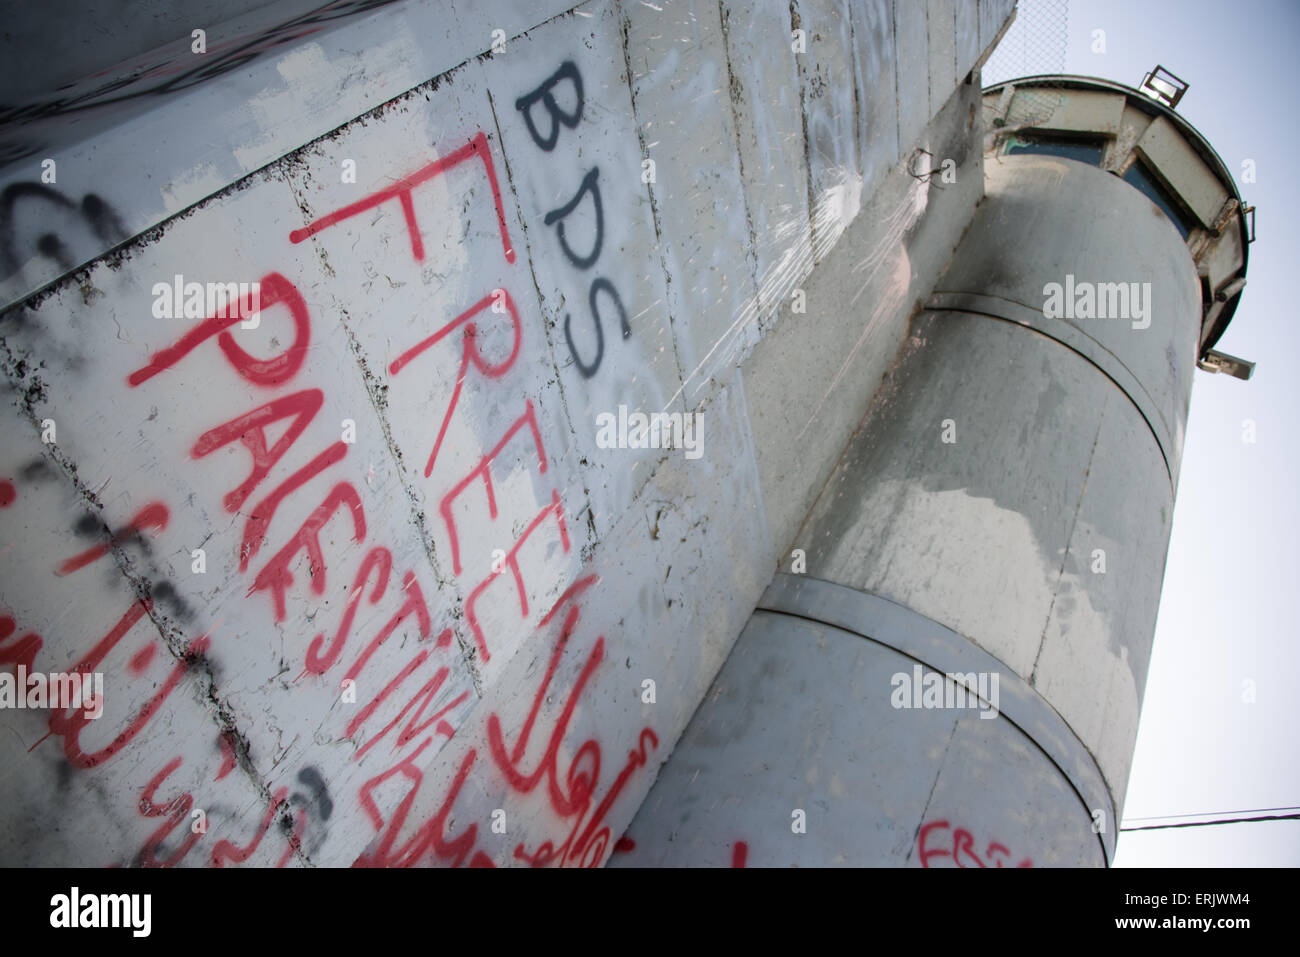 Graffiti on the Israeli separation wall dividing Bethlehem, West Bank, promotes the boycott, divestment, sanctions - Stock Image